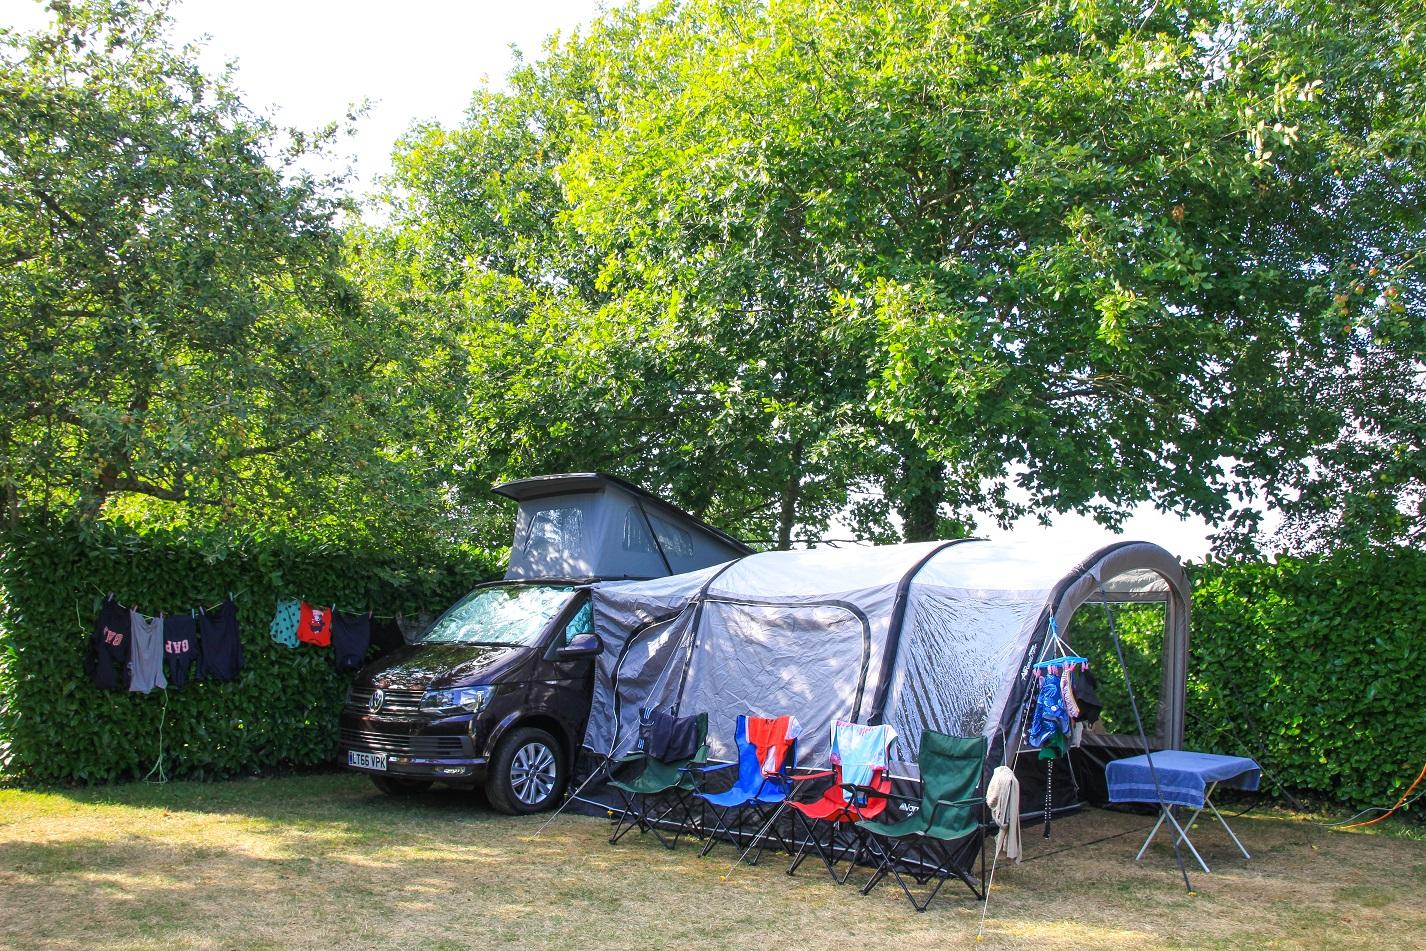 camping clohars carnoet; groix; camping morbihan; bretagne sud